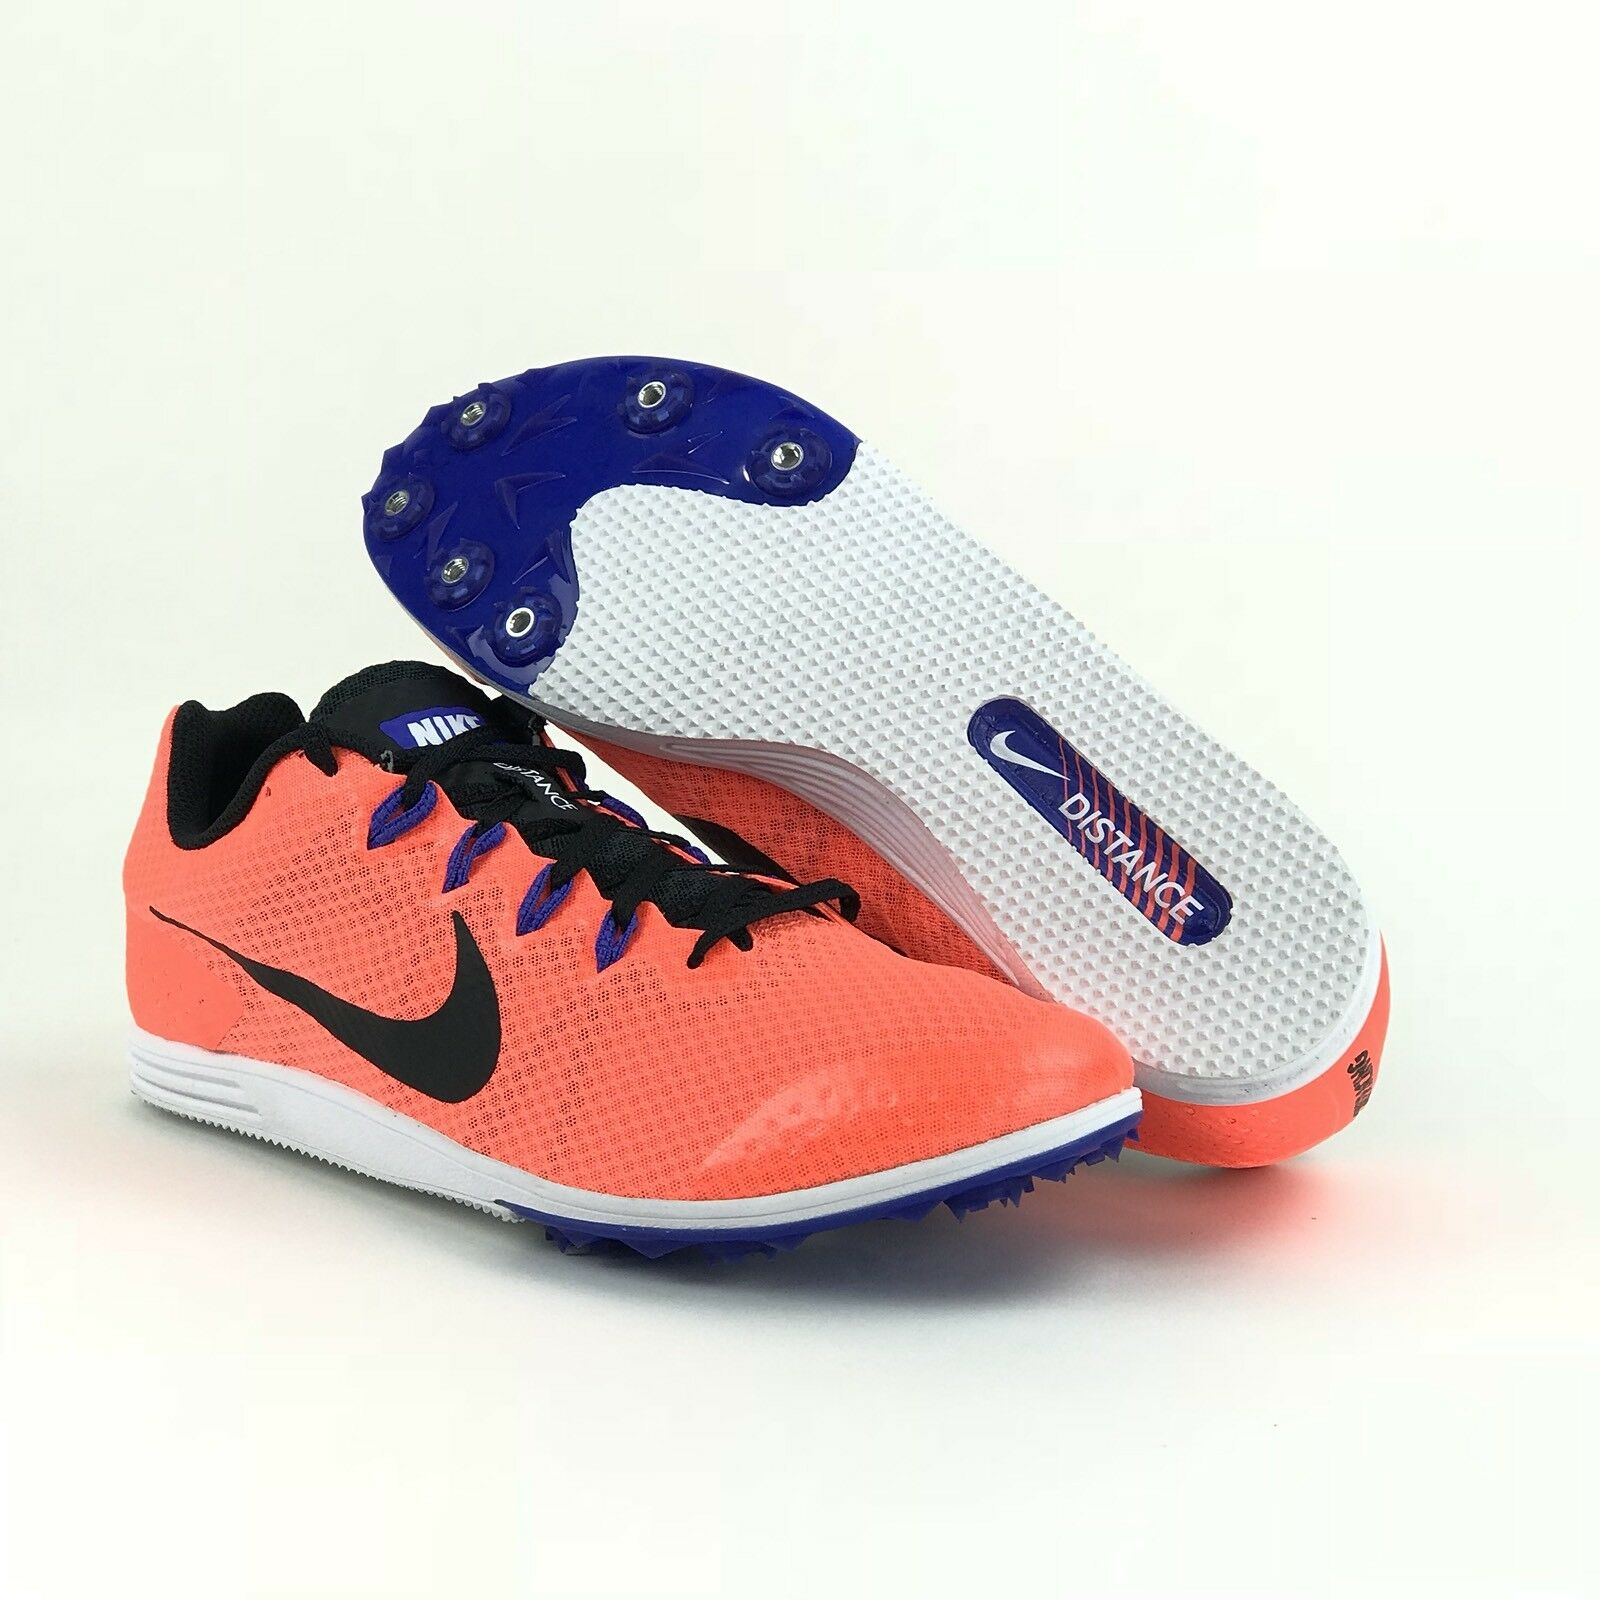 3af8e3462 Nike Racing Mens Mens Mens Rival D Distance Orange Track Running Shoes  Spikes 74725c